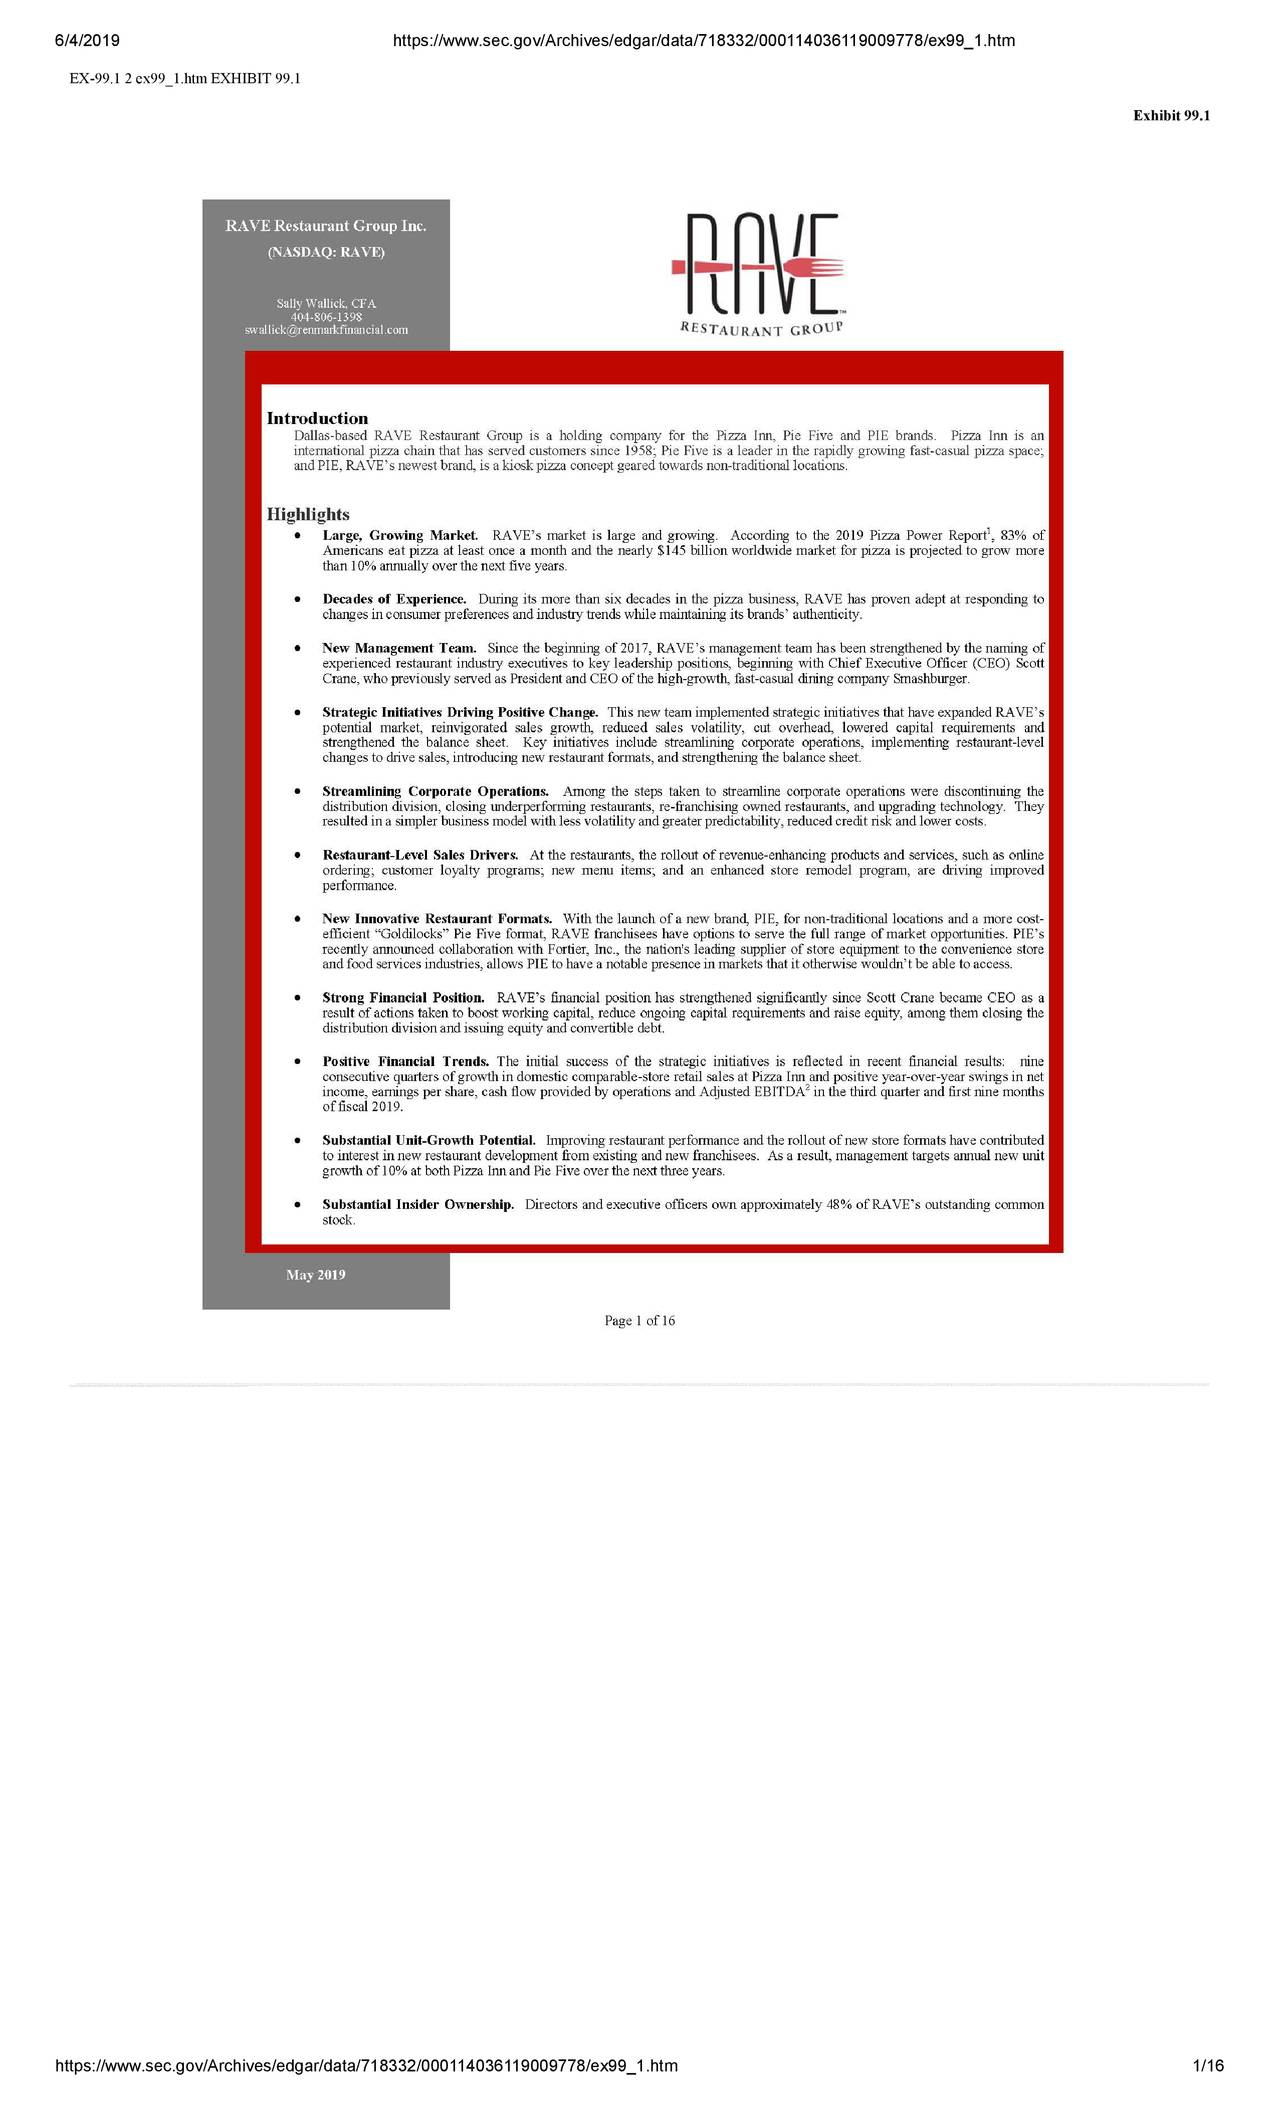 RAVE Stock Financials - (754198109) - Stock Analysis